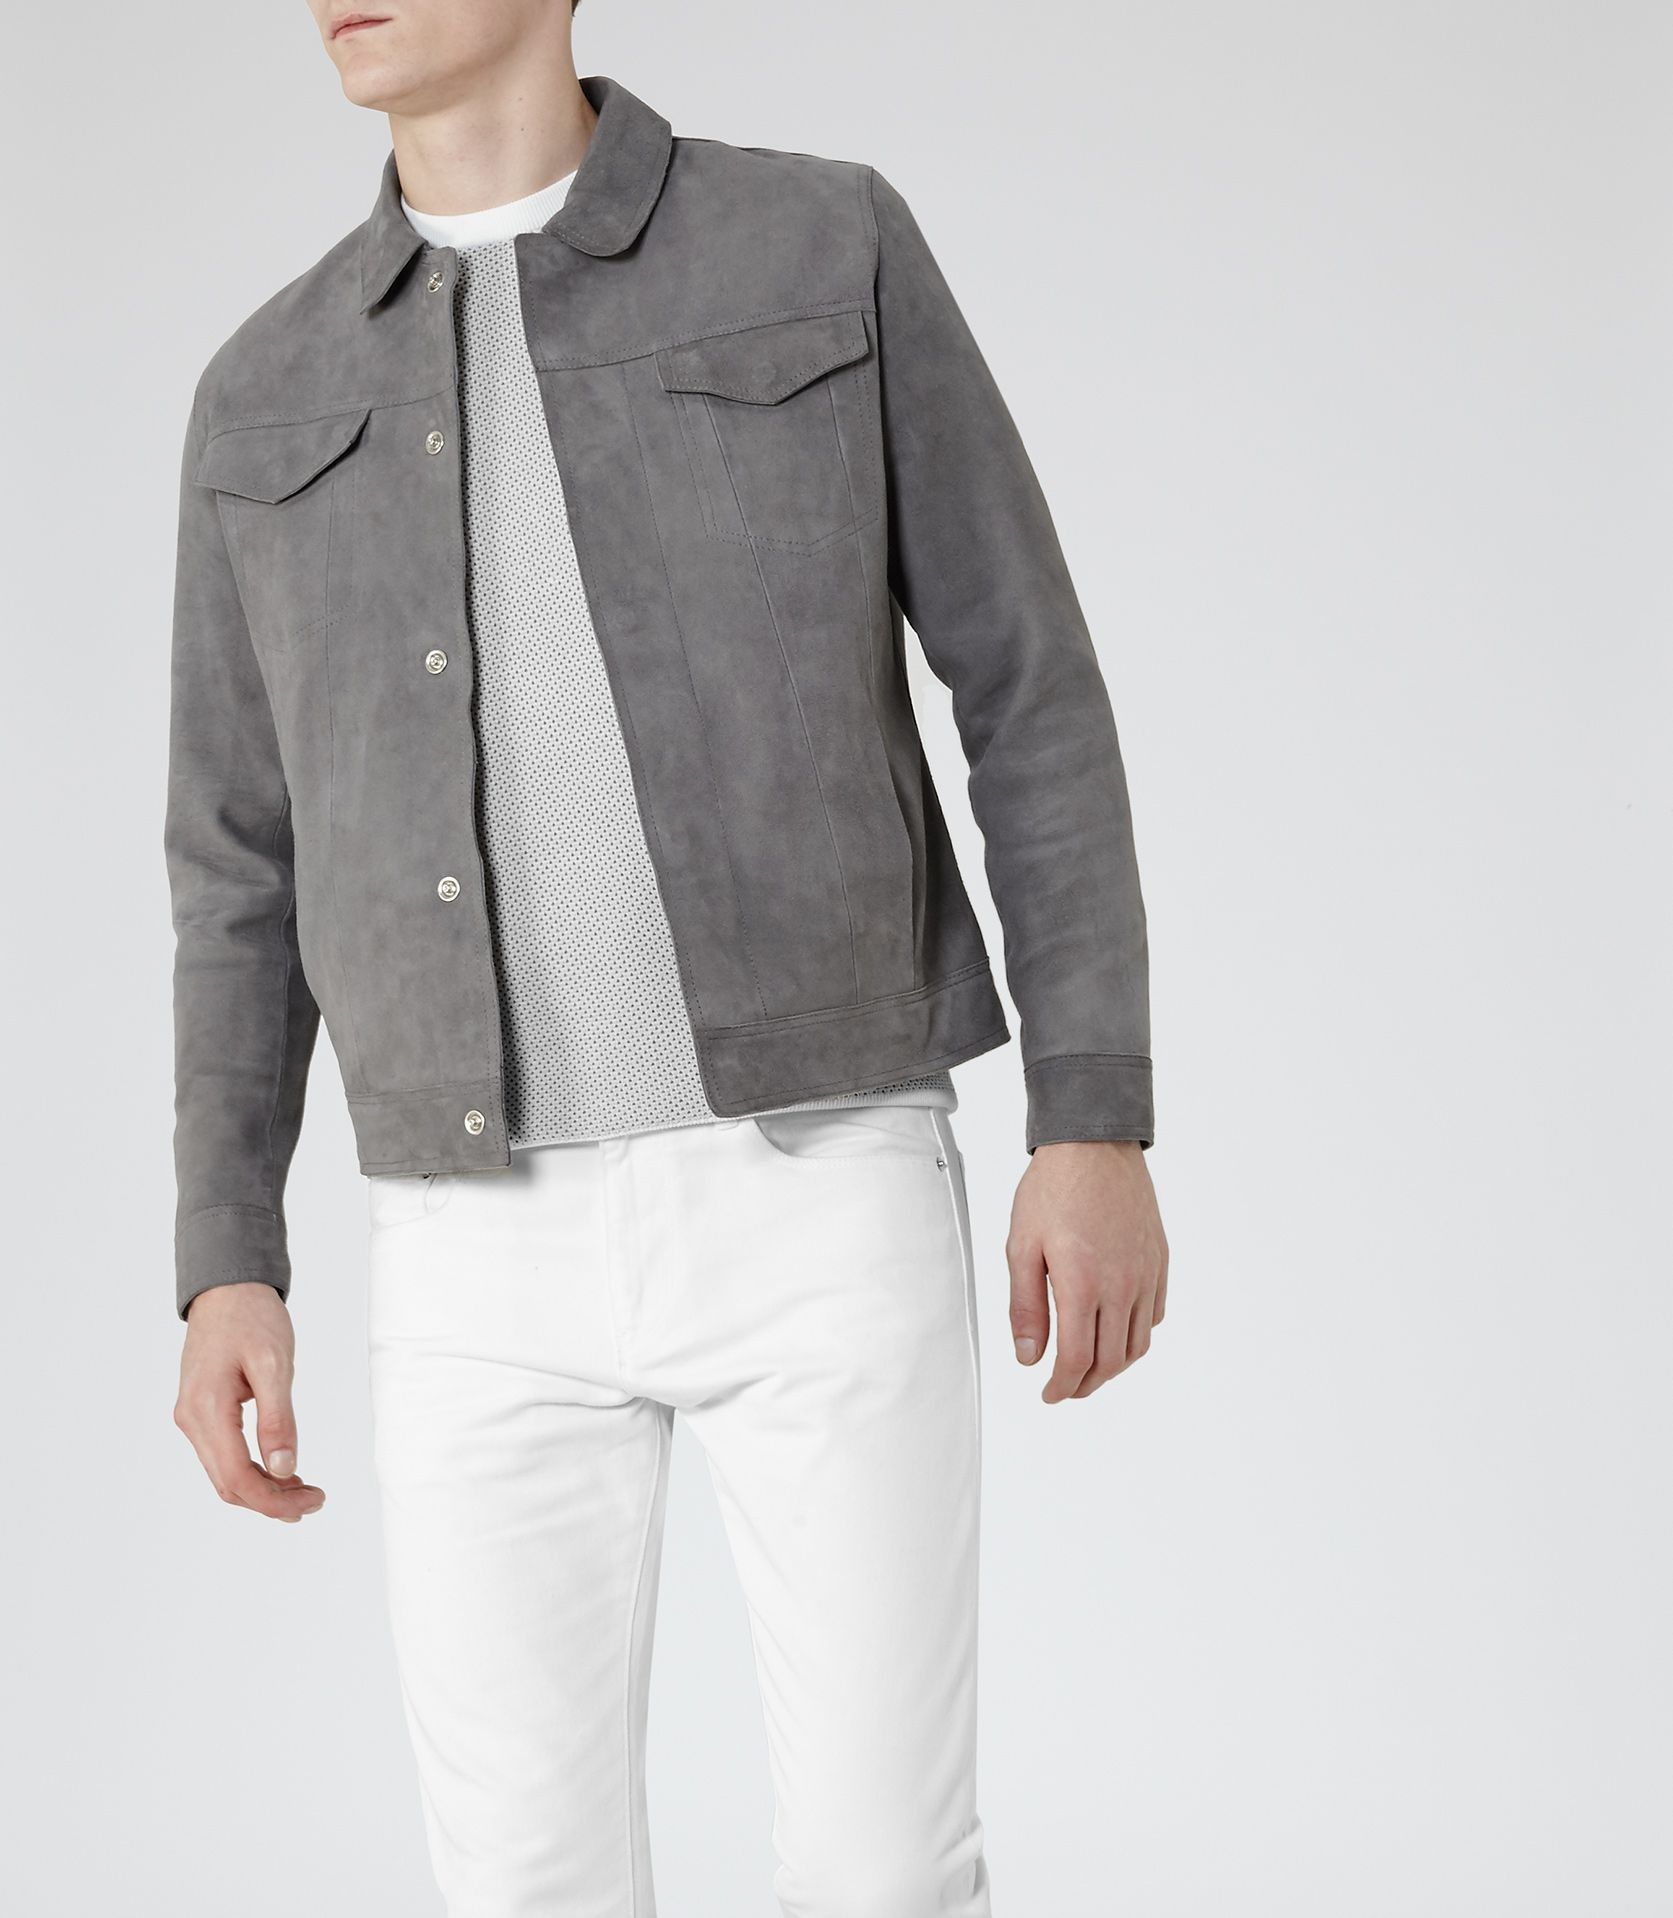 592819cfb Mens Grey Suede Jacket - Reiss Bastian | Smart Casual in 2019 | Grey ...